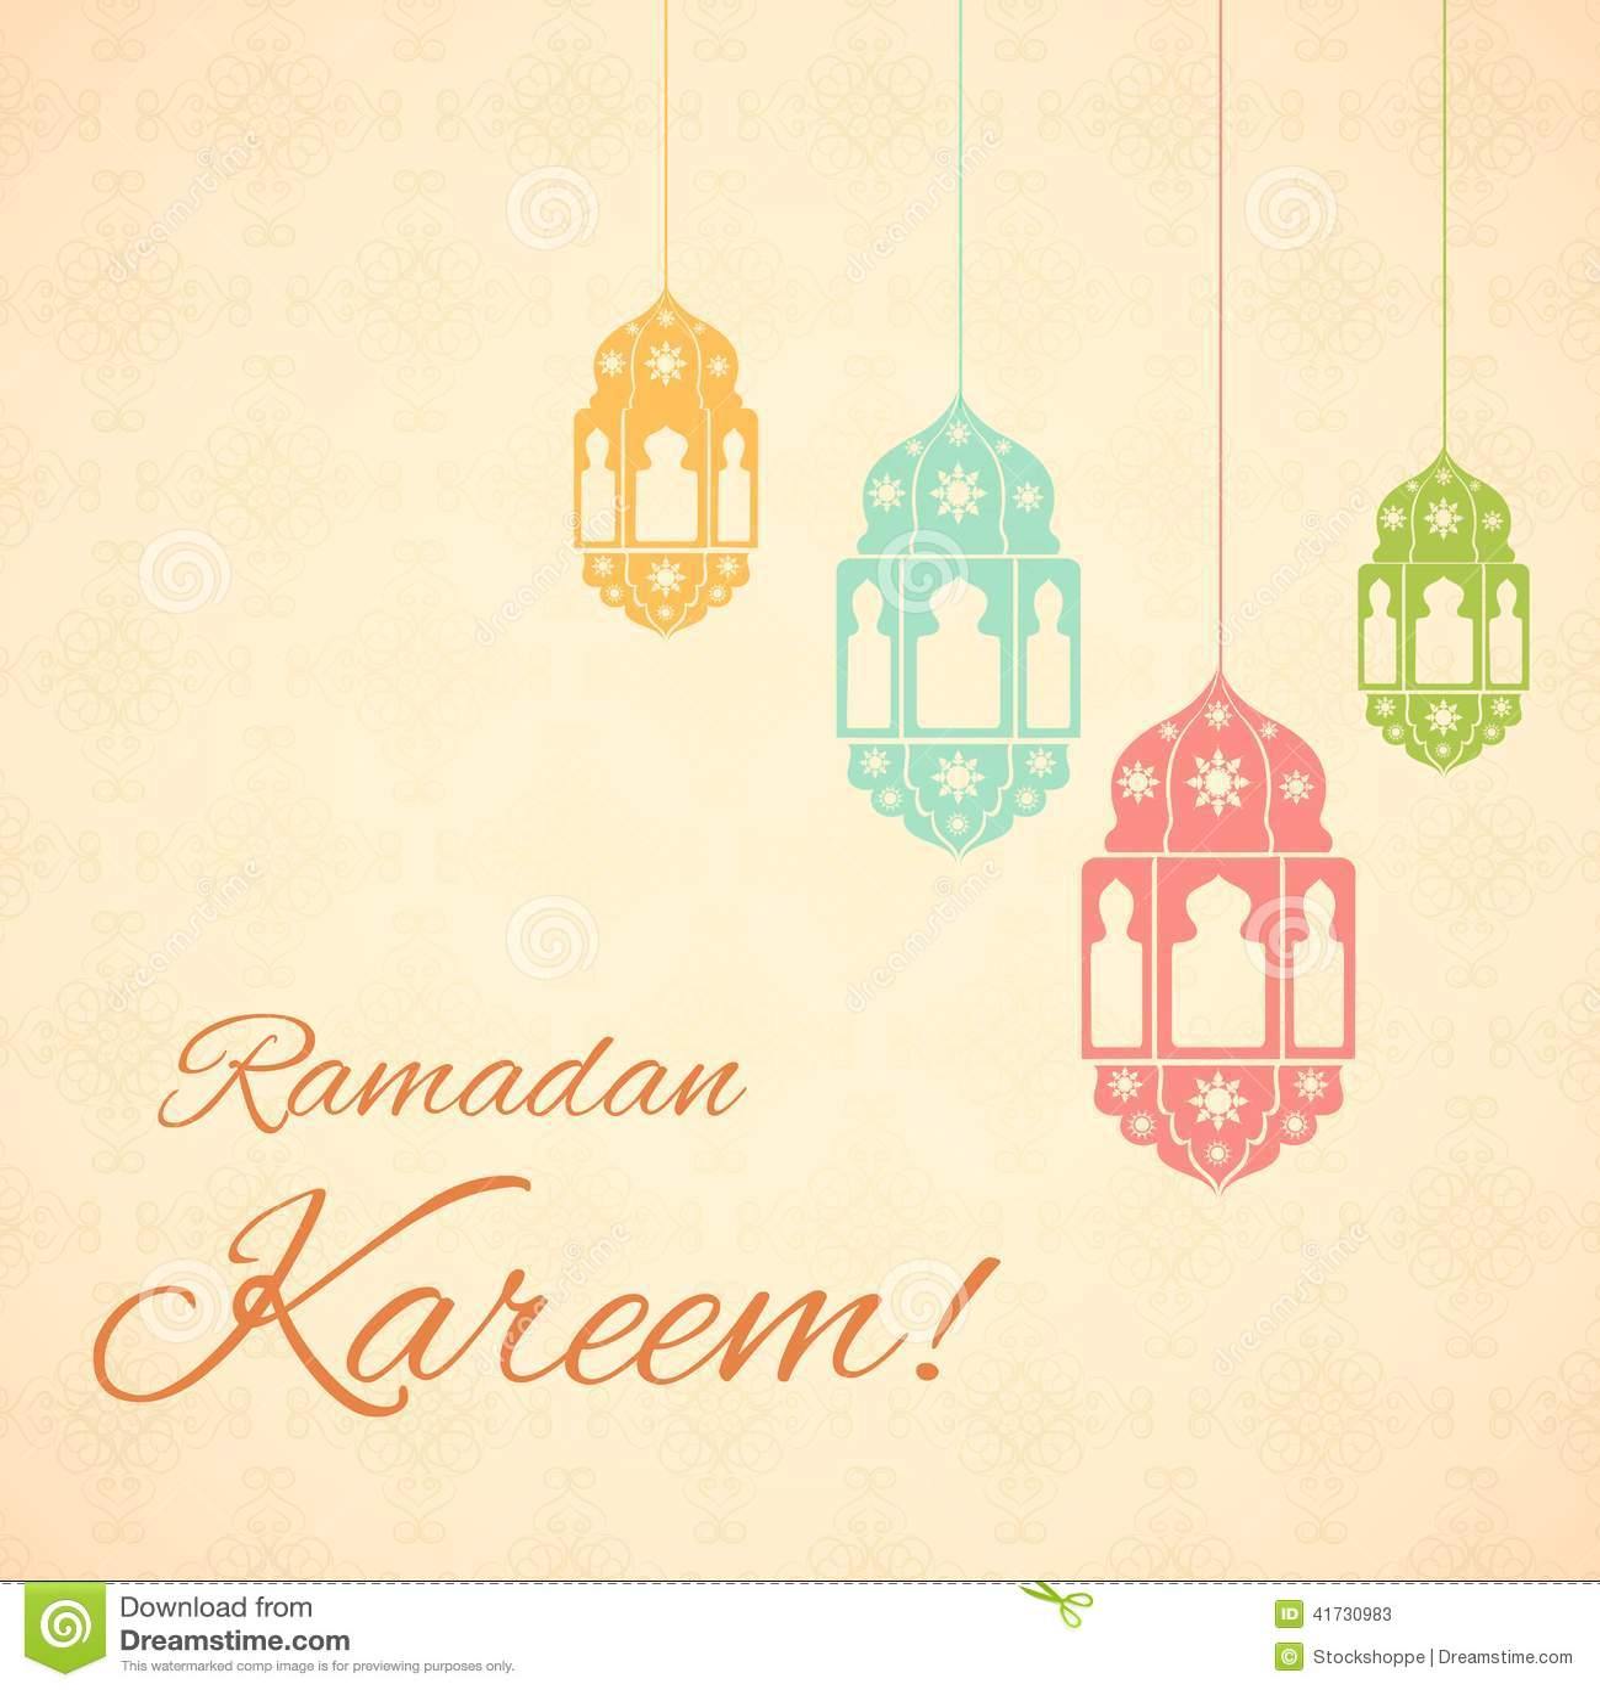 Ramadan kareem greetings for ramadan background stock vector ramadan kareem greetings for ramadan background m4hsunfo